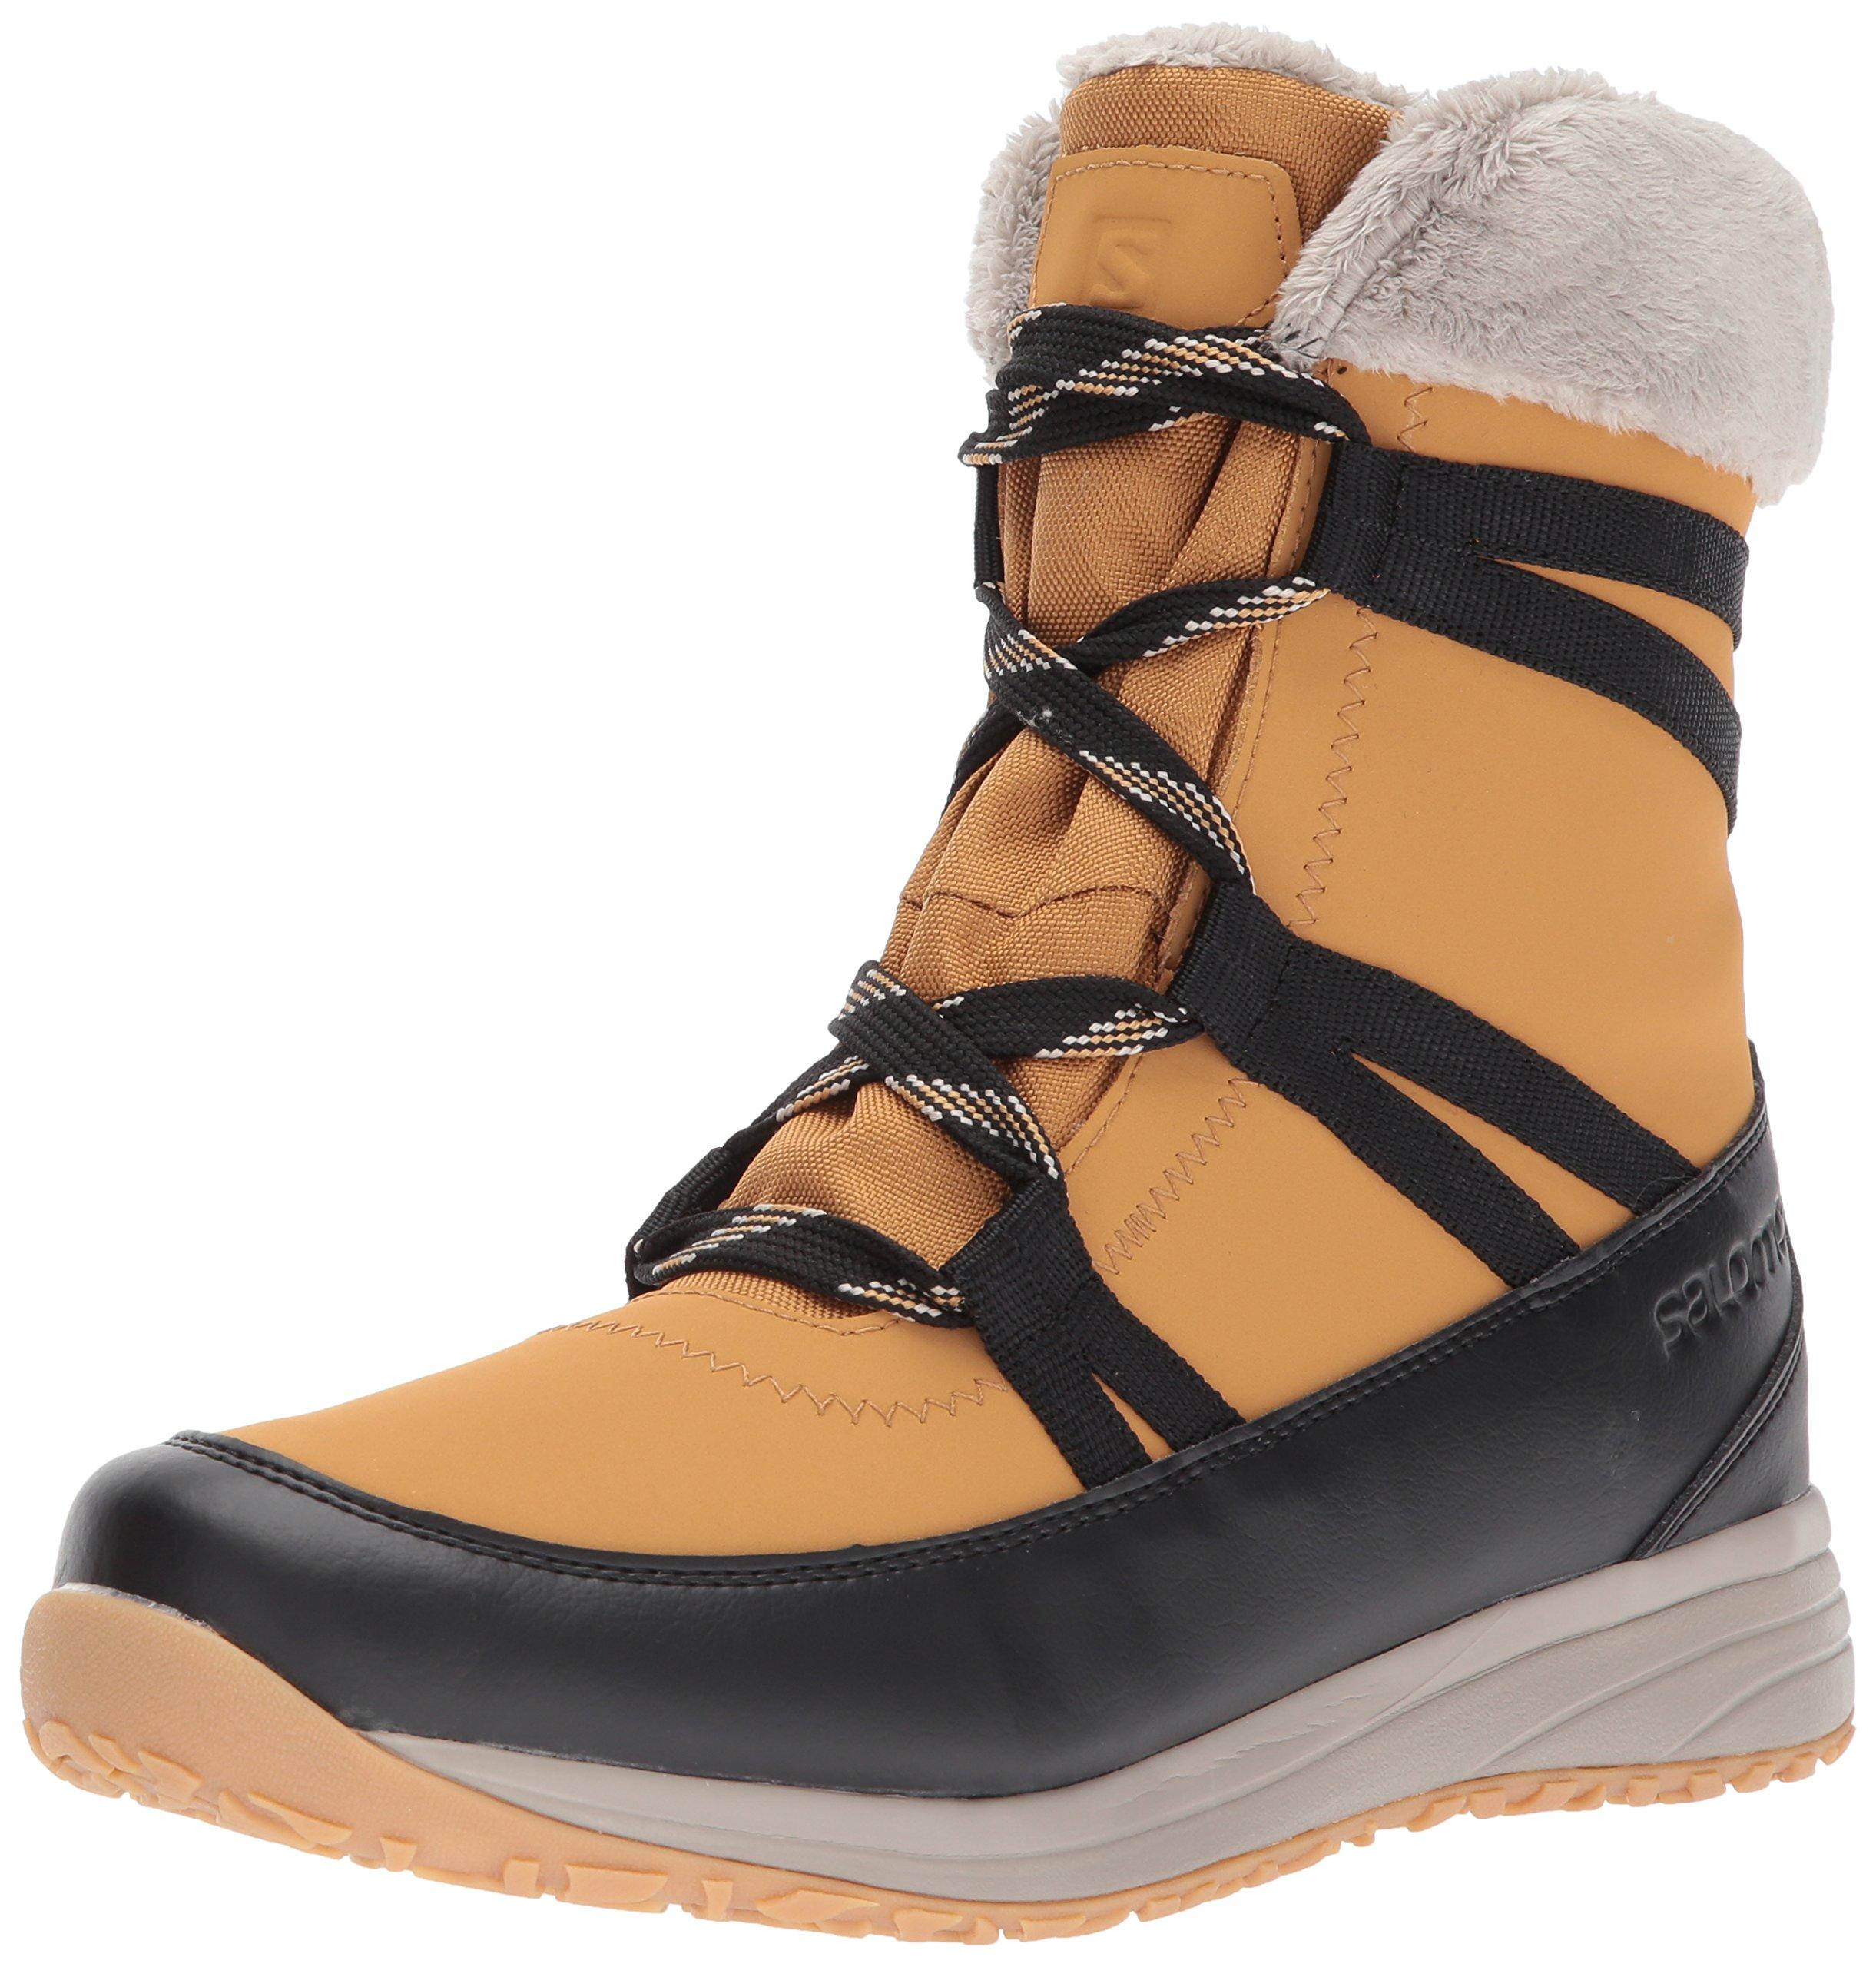 Salomon Women's Heika Ltr CS Waterproof Snow Boot, Camel Gold Leather/Black/Vintage Kaki, 6 M US by Salomon